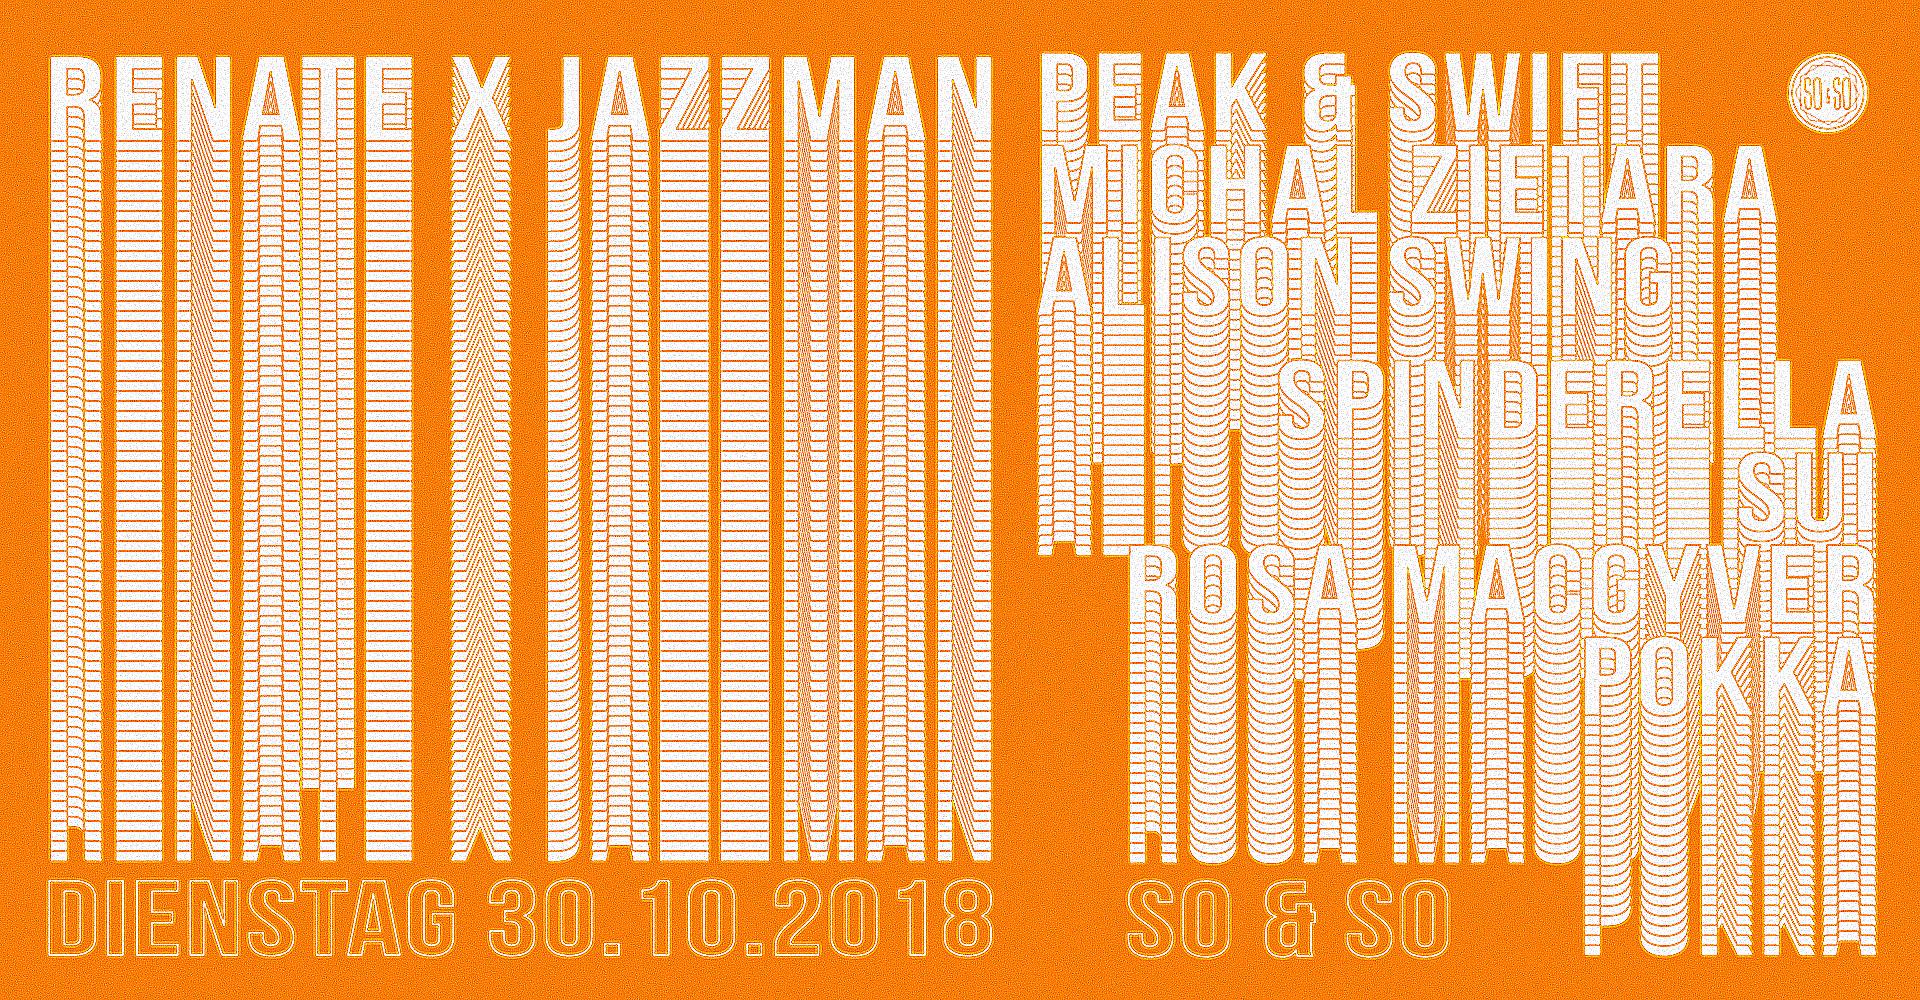 Renate x Jazzman